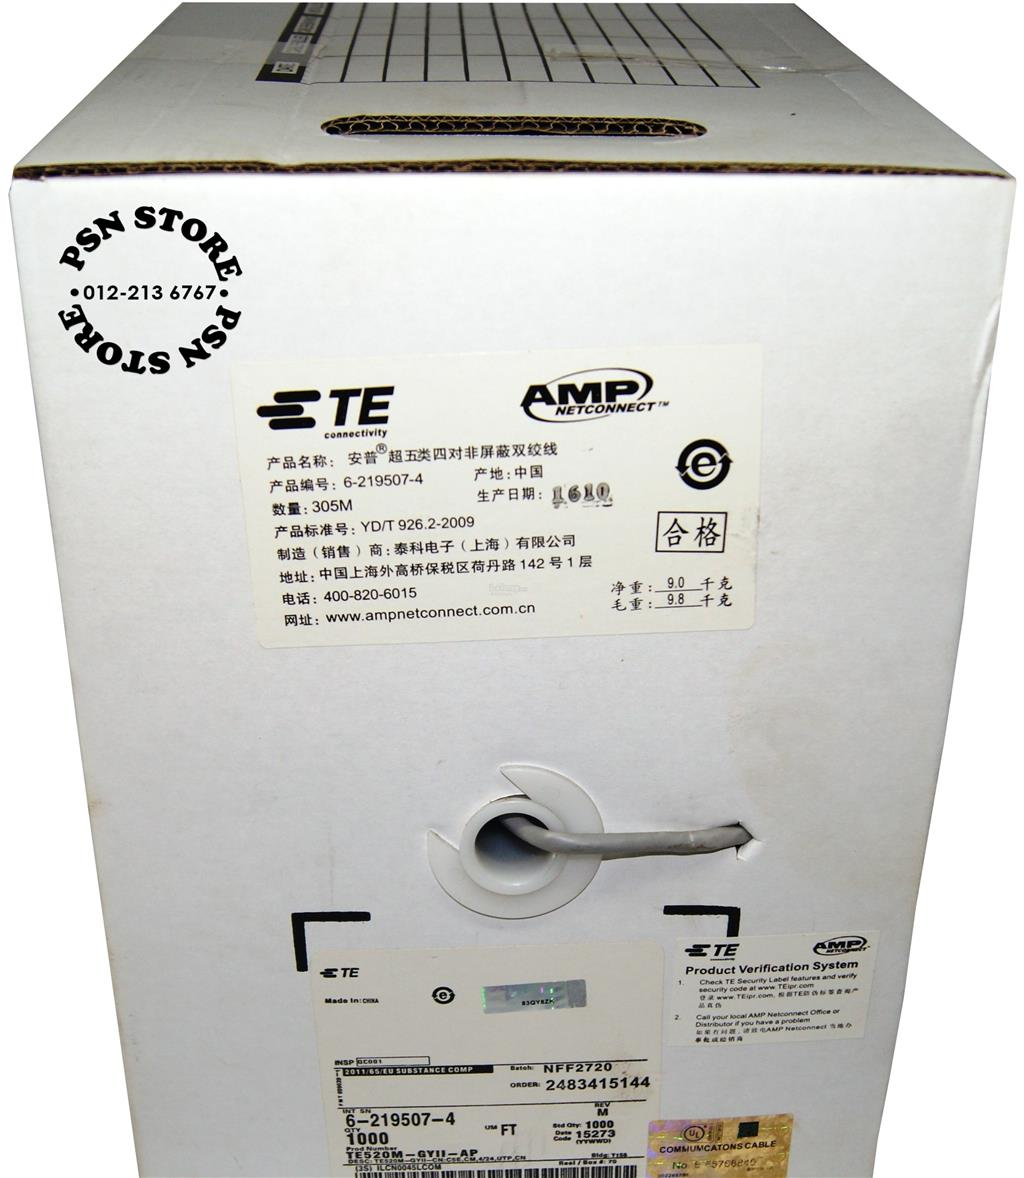 AMP Cat-5e UTP cable ~ 305 mtr (White jacket)